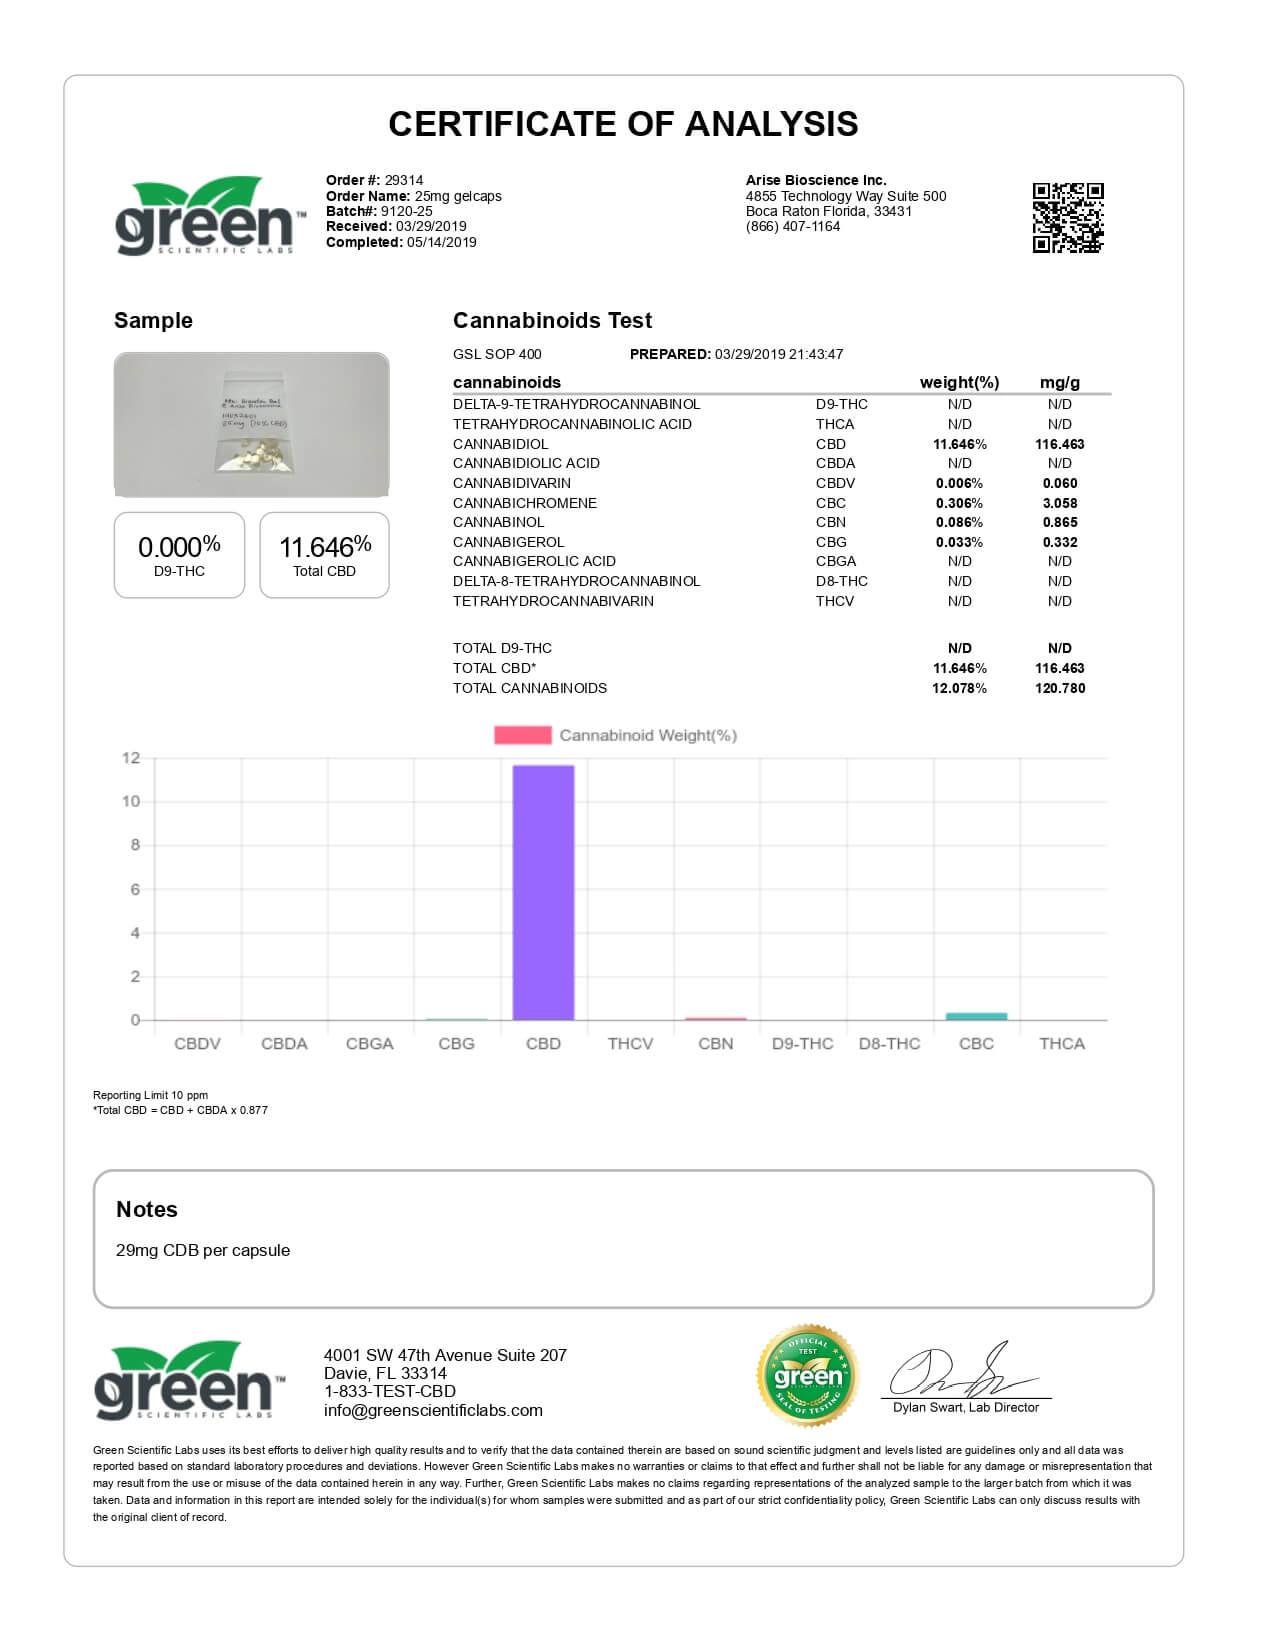 Funky Farms CBD Gel Caps 750mg Lab Report